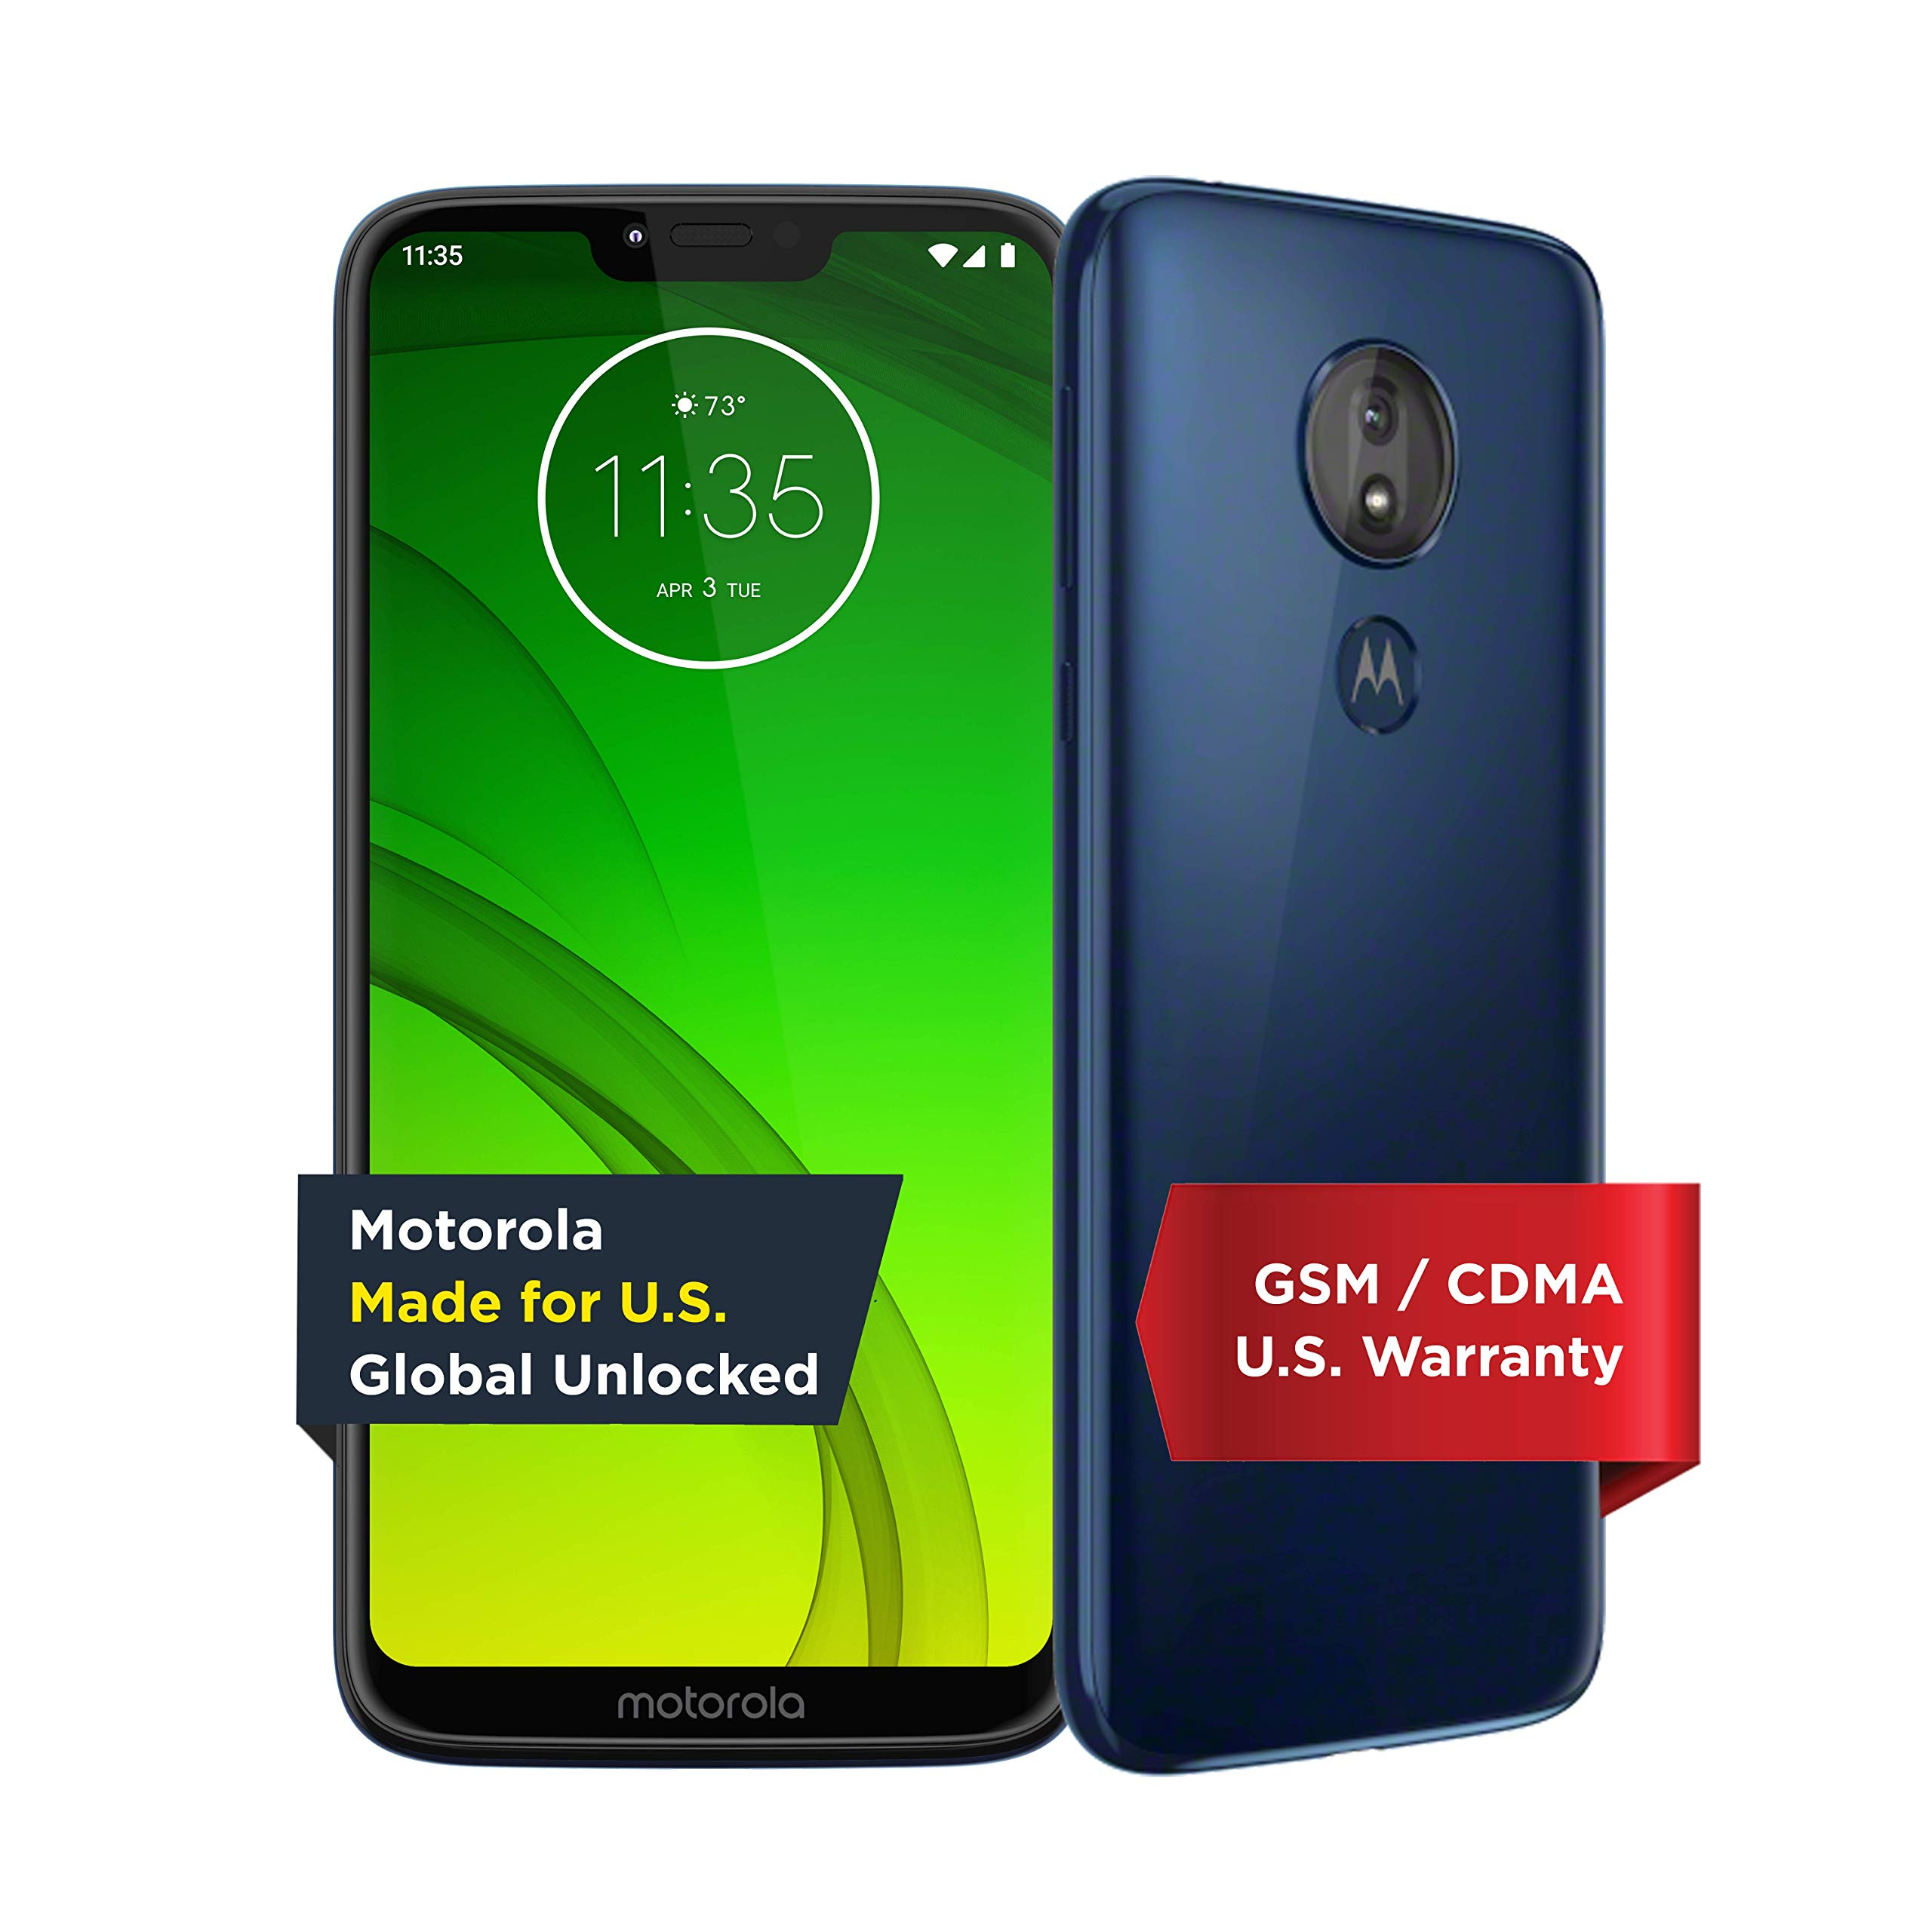 Motorola Moto G7 Power - Unlocked - 32 GB - Marine Blue (US Warranty) - Verizon, AT&T, T-Mobile, Sprint, Boost, Cricket, &...